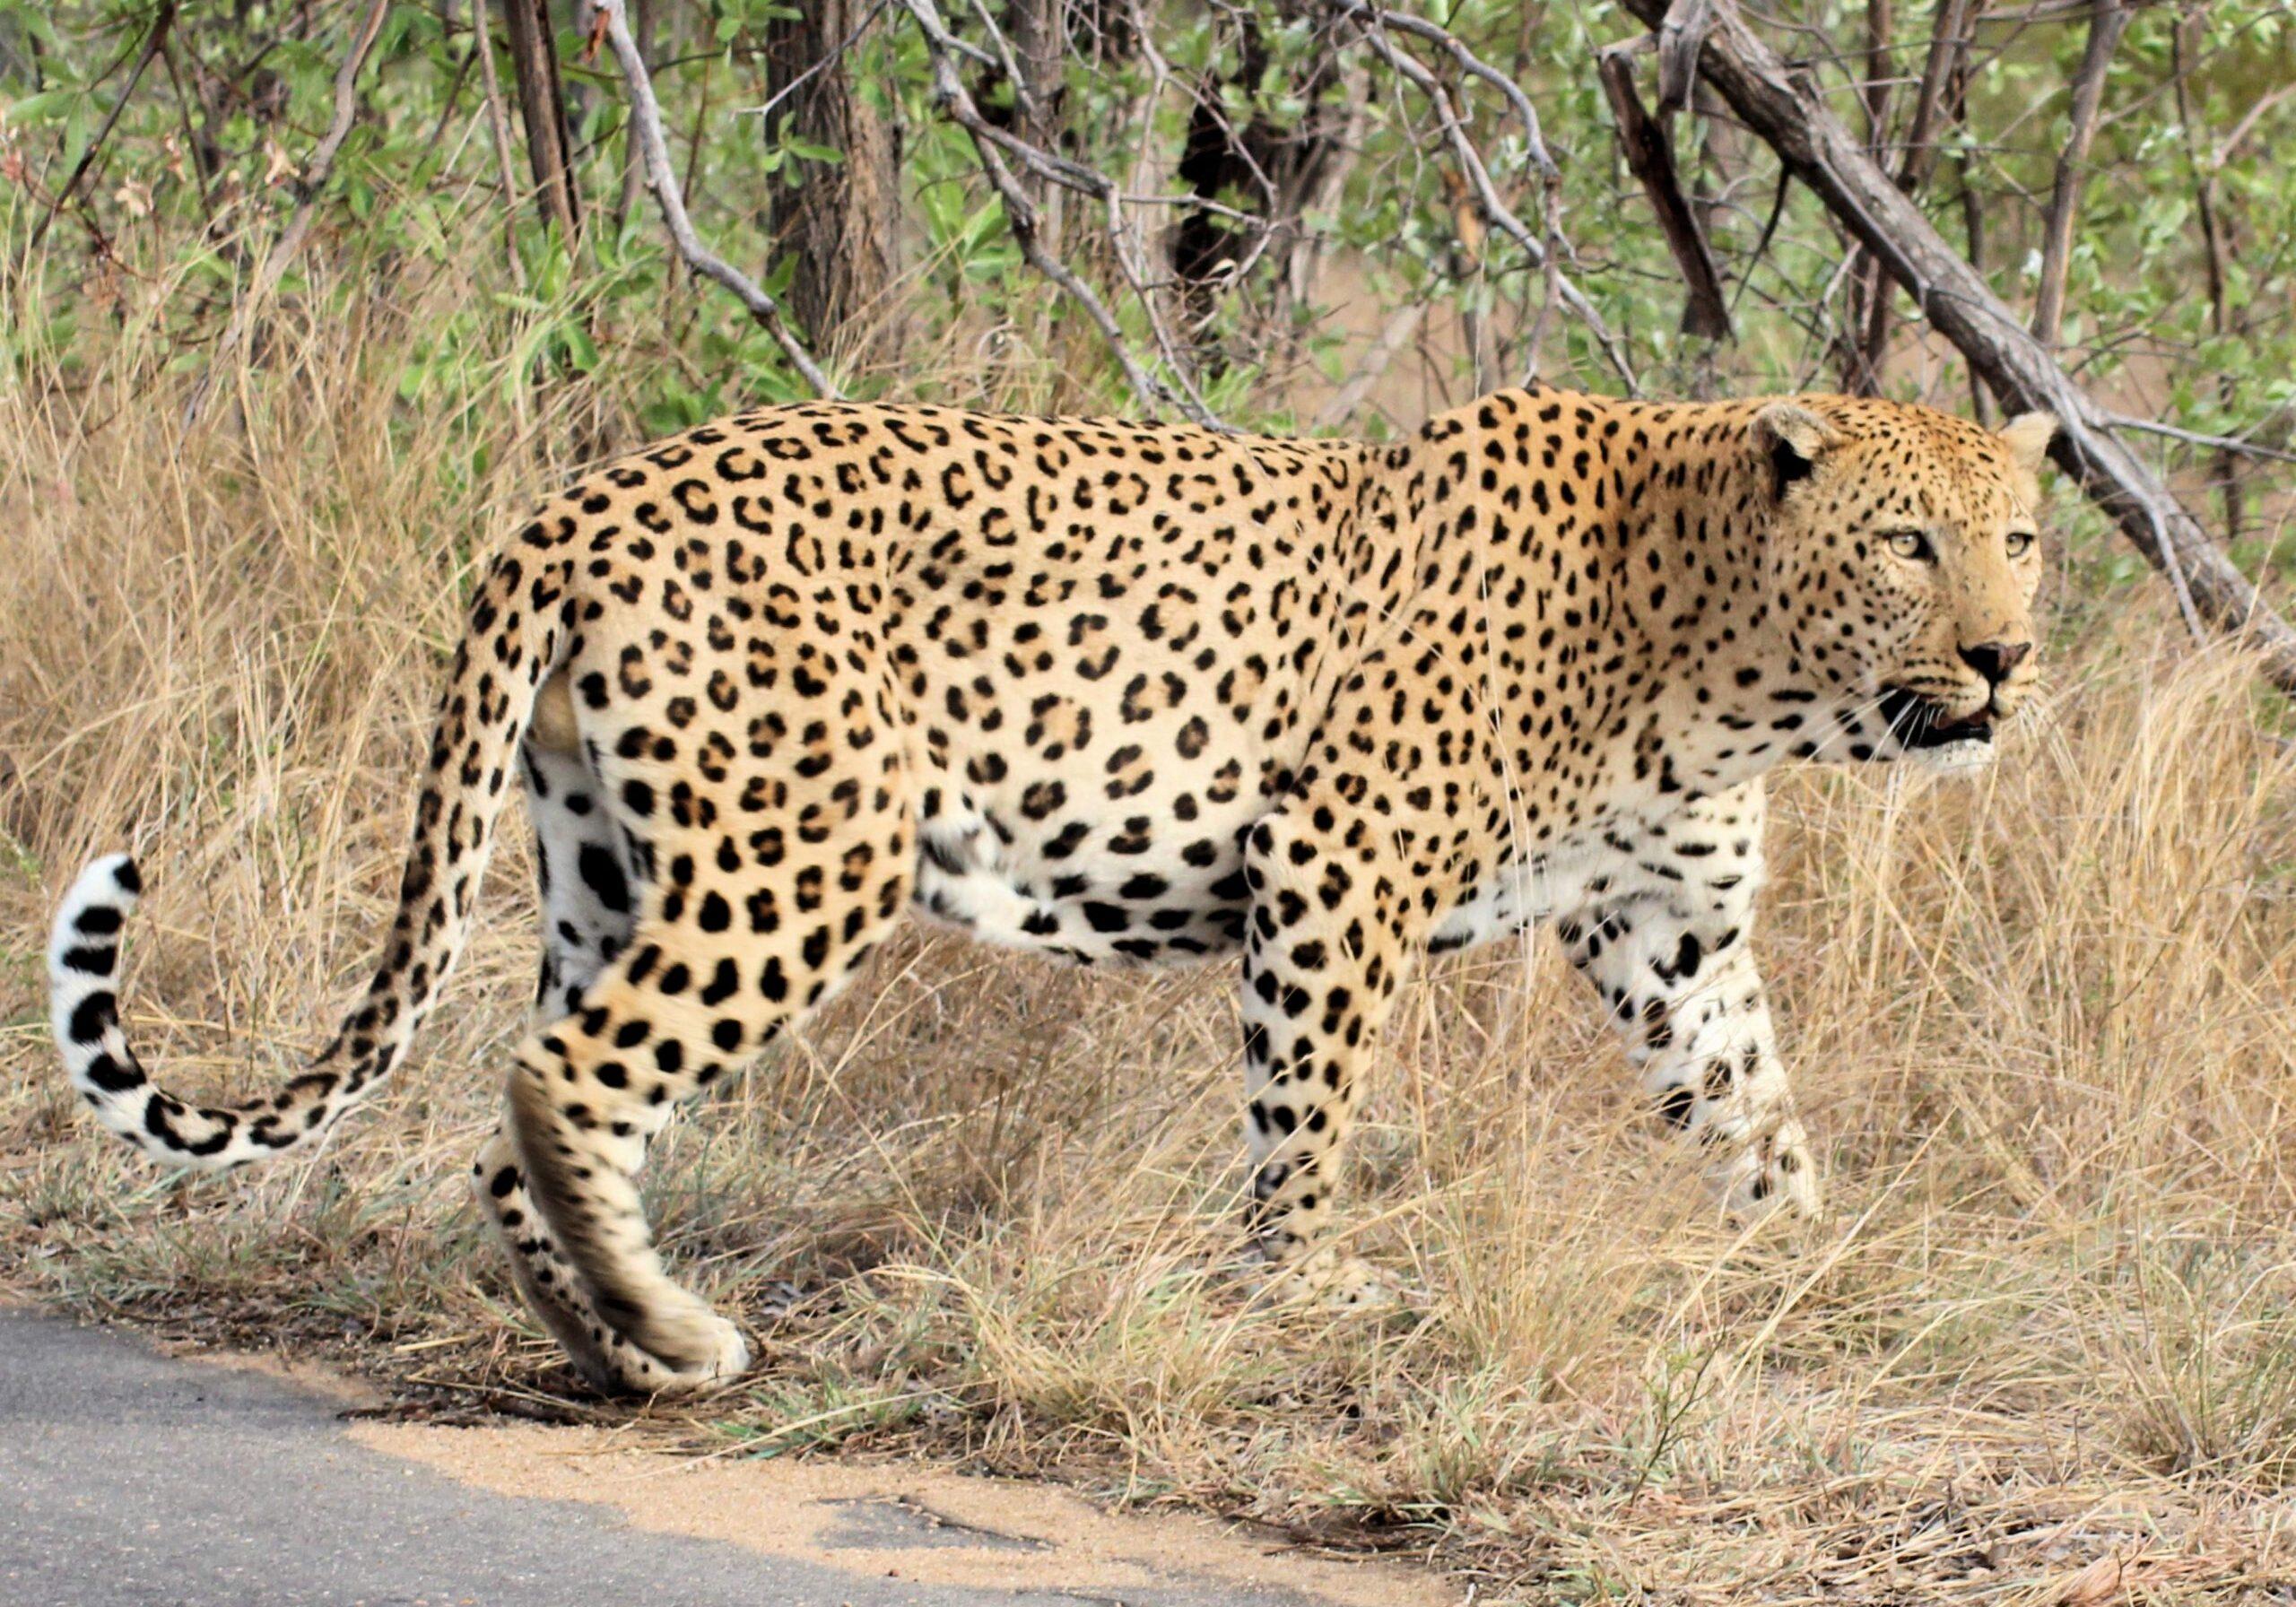 African Leopard Xongi-tings & Xongi-pedia (Mammal - Carnivore)